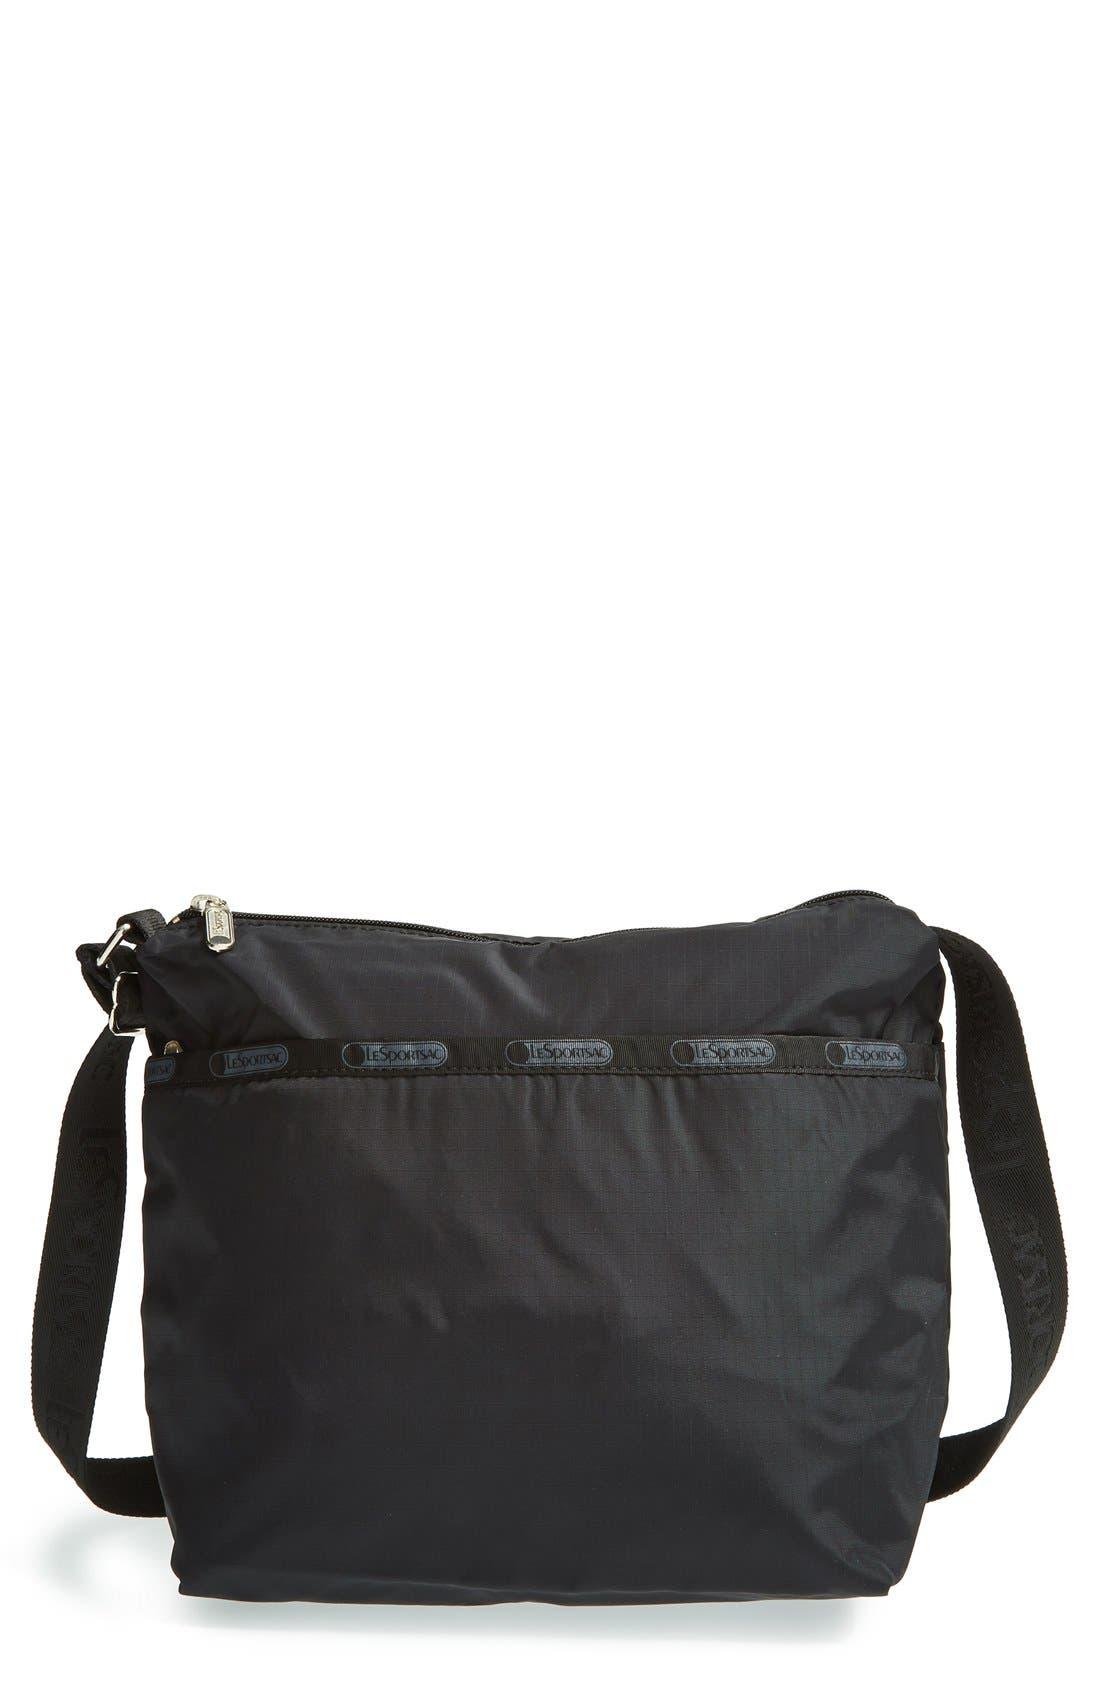 LESPORTSAC 'Small Cleo' Crossbody Bag, Main, color, 002